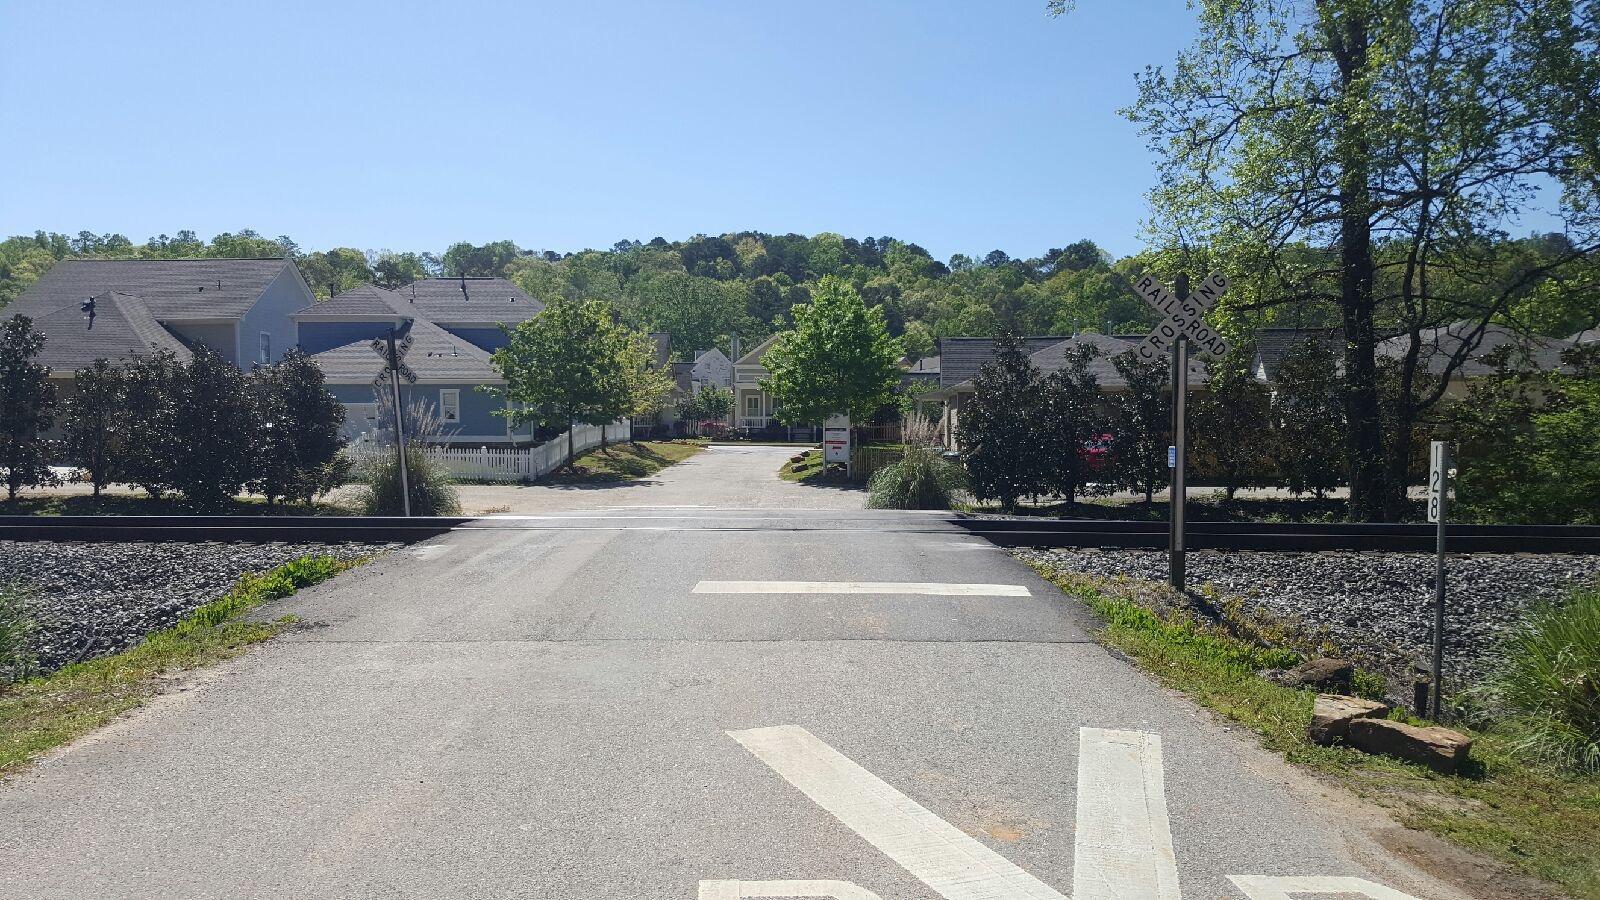 Mayor halts all new building permits in Trussville Springs development